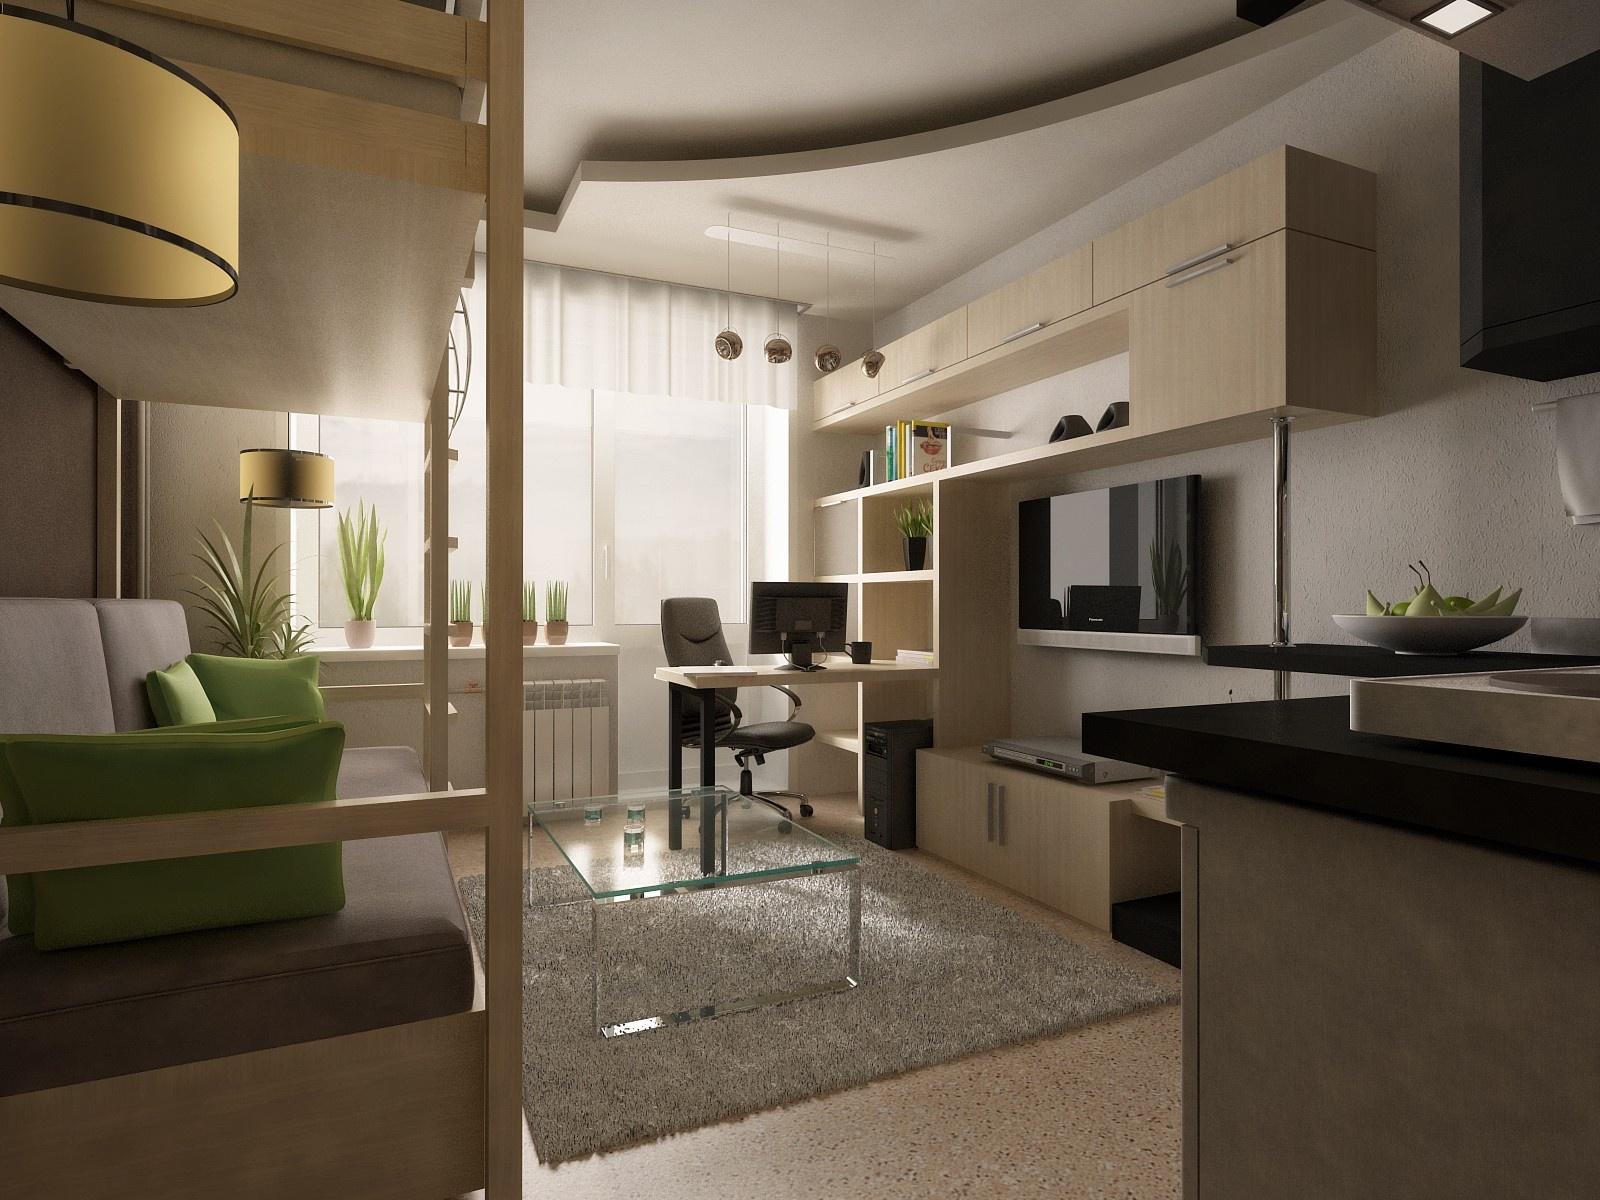 Квартира студия 18 кв м дизайн